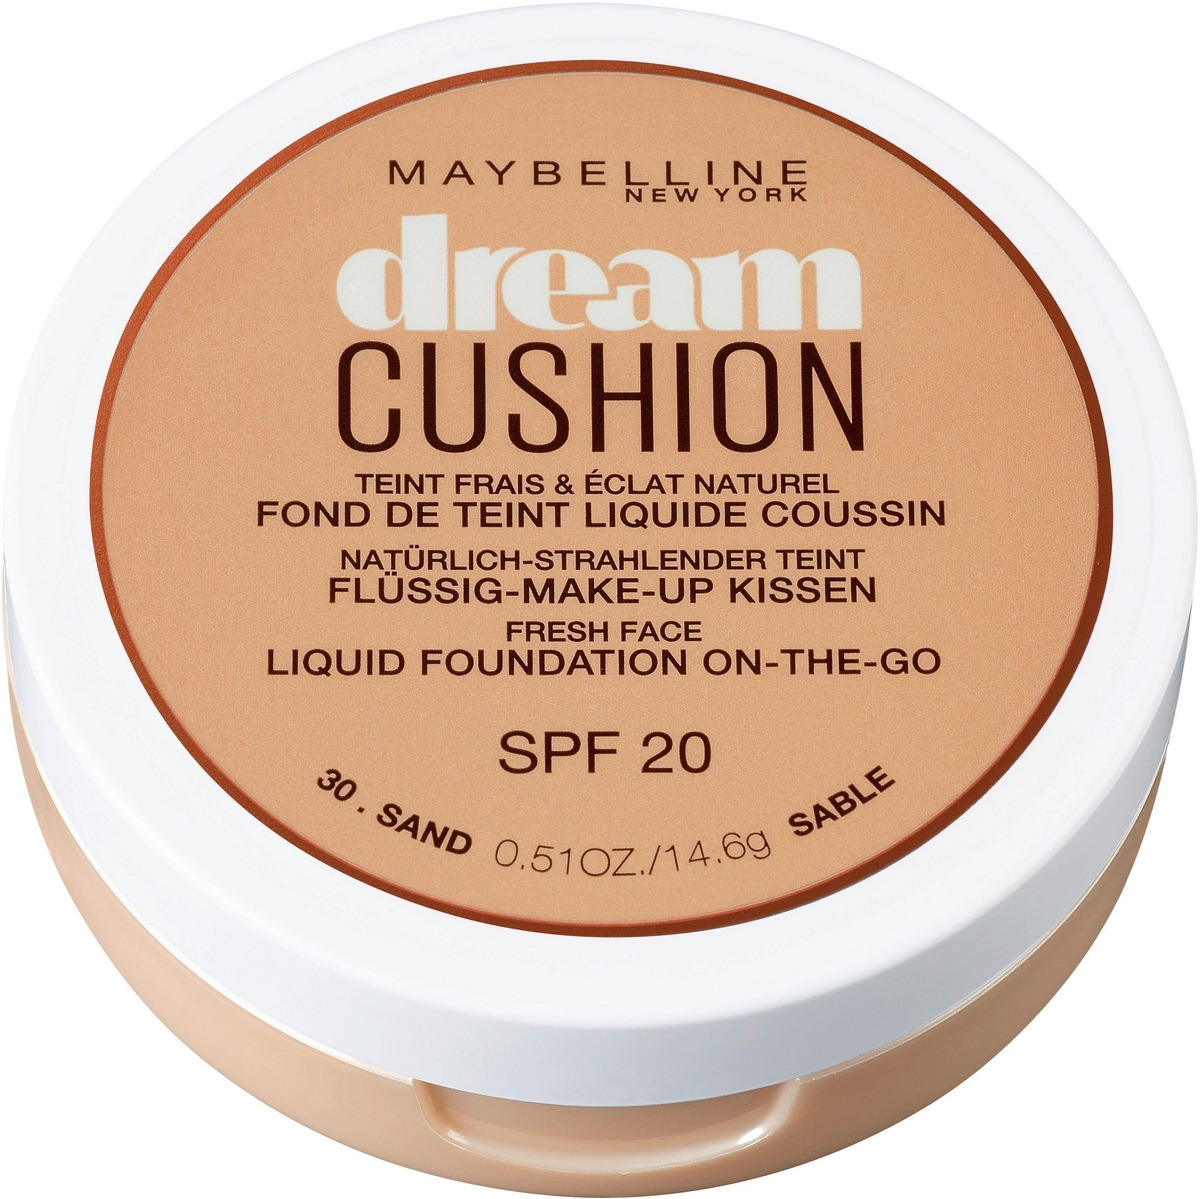 Maybelline New York Тональный крем-кушон для лица Dream Cushion, увлажняющий, оттенок 30 Sand, SPF 20, 14,6 г